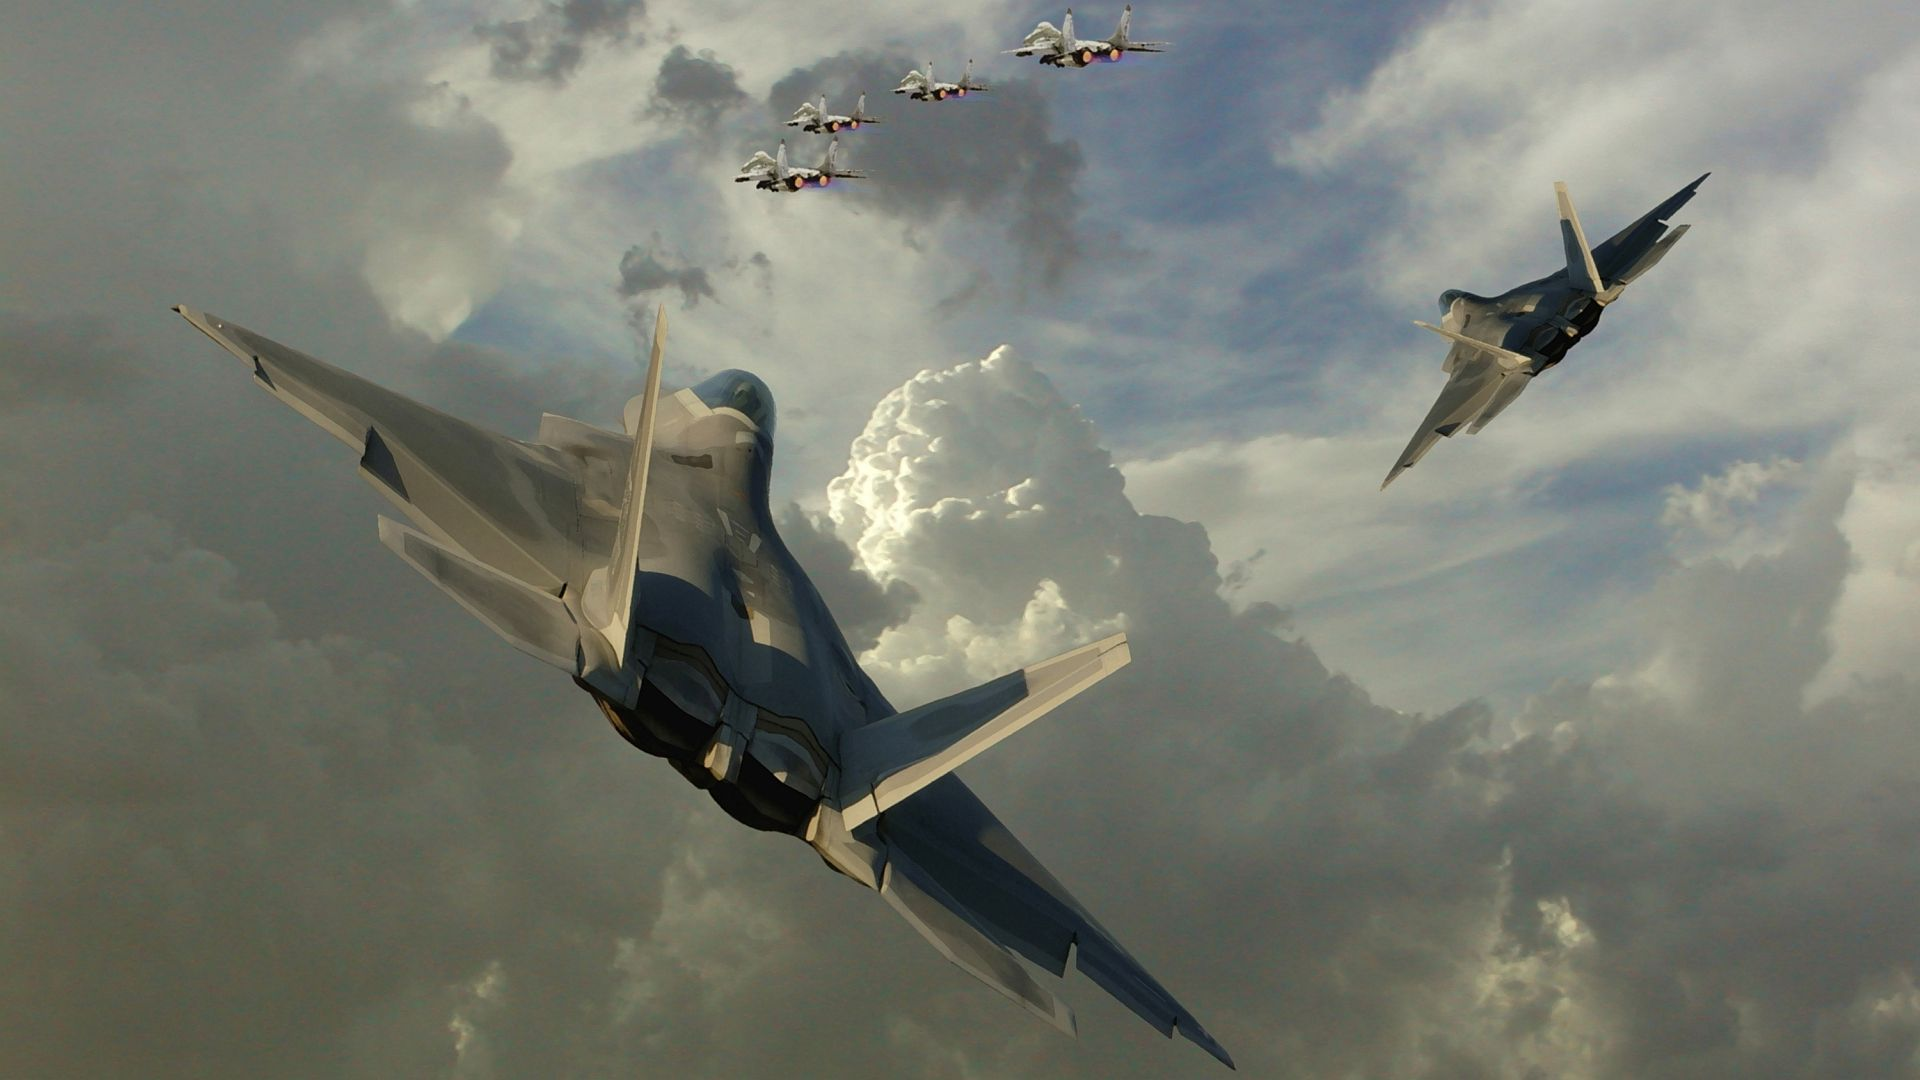 Free Download Lockheed Martin F 22 Raptor Widescreen Wallpaper